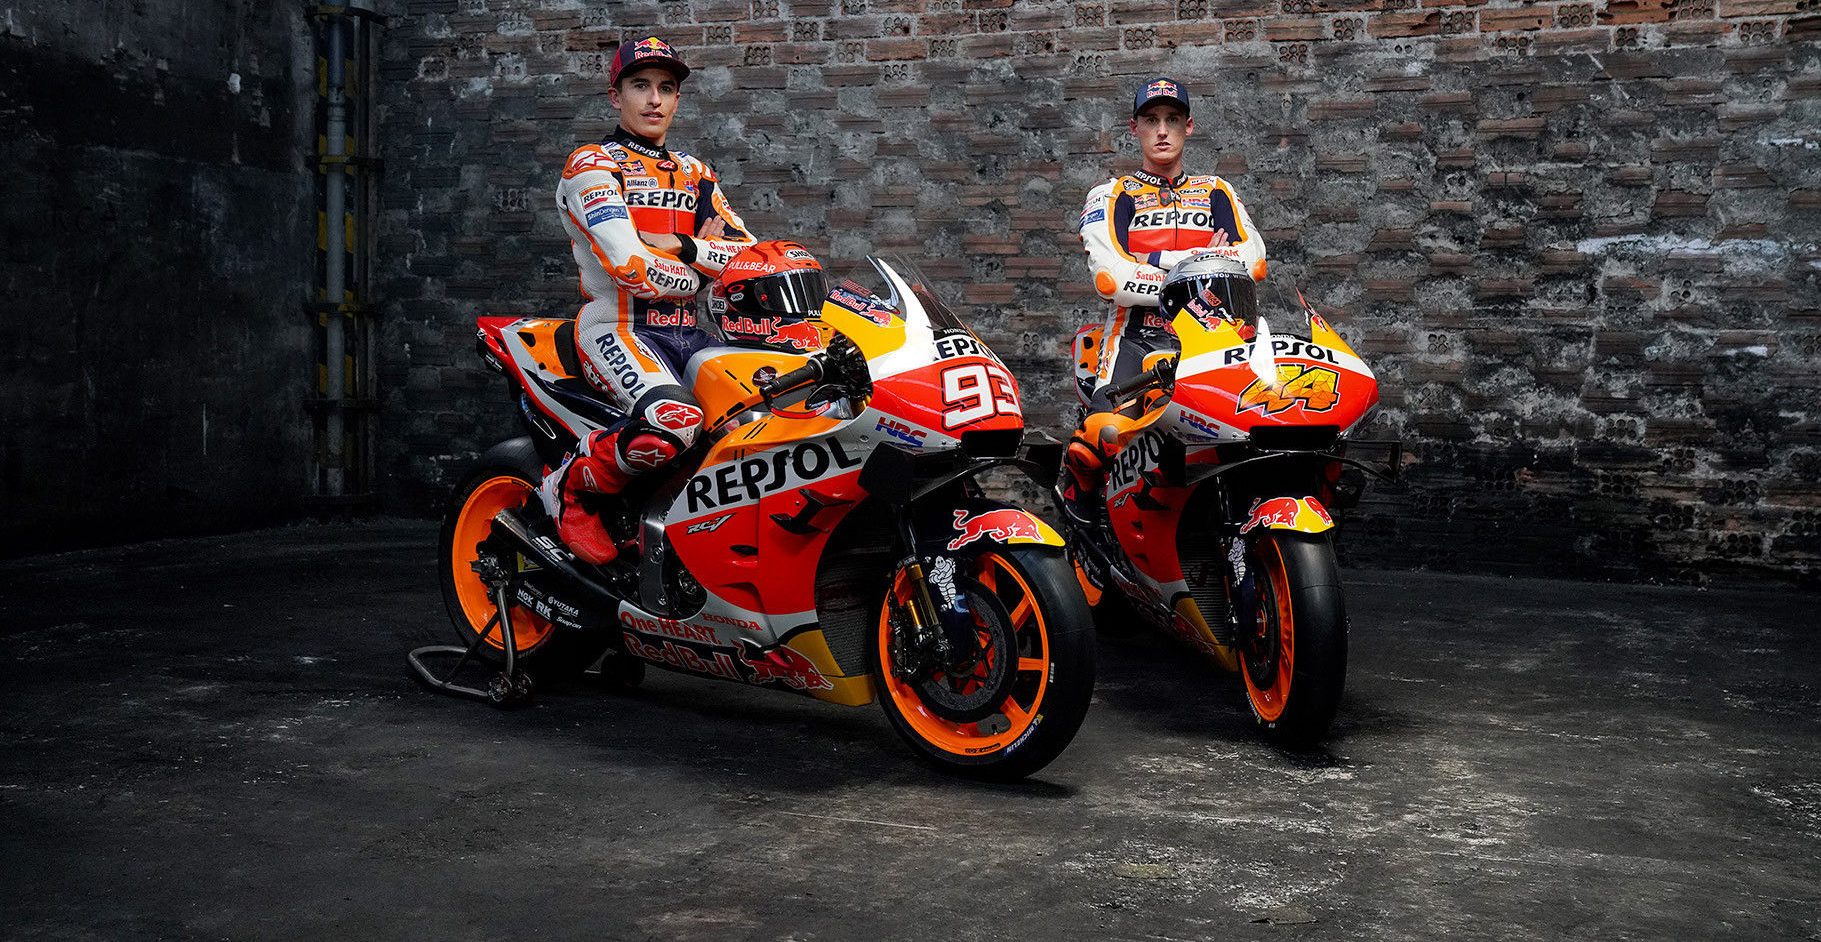 Repsol Honda's Marc Marquez (left) and Pol Espargaro (right). Photo courtesy Repsol Honda.